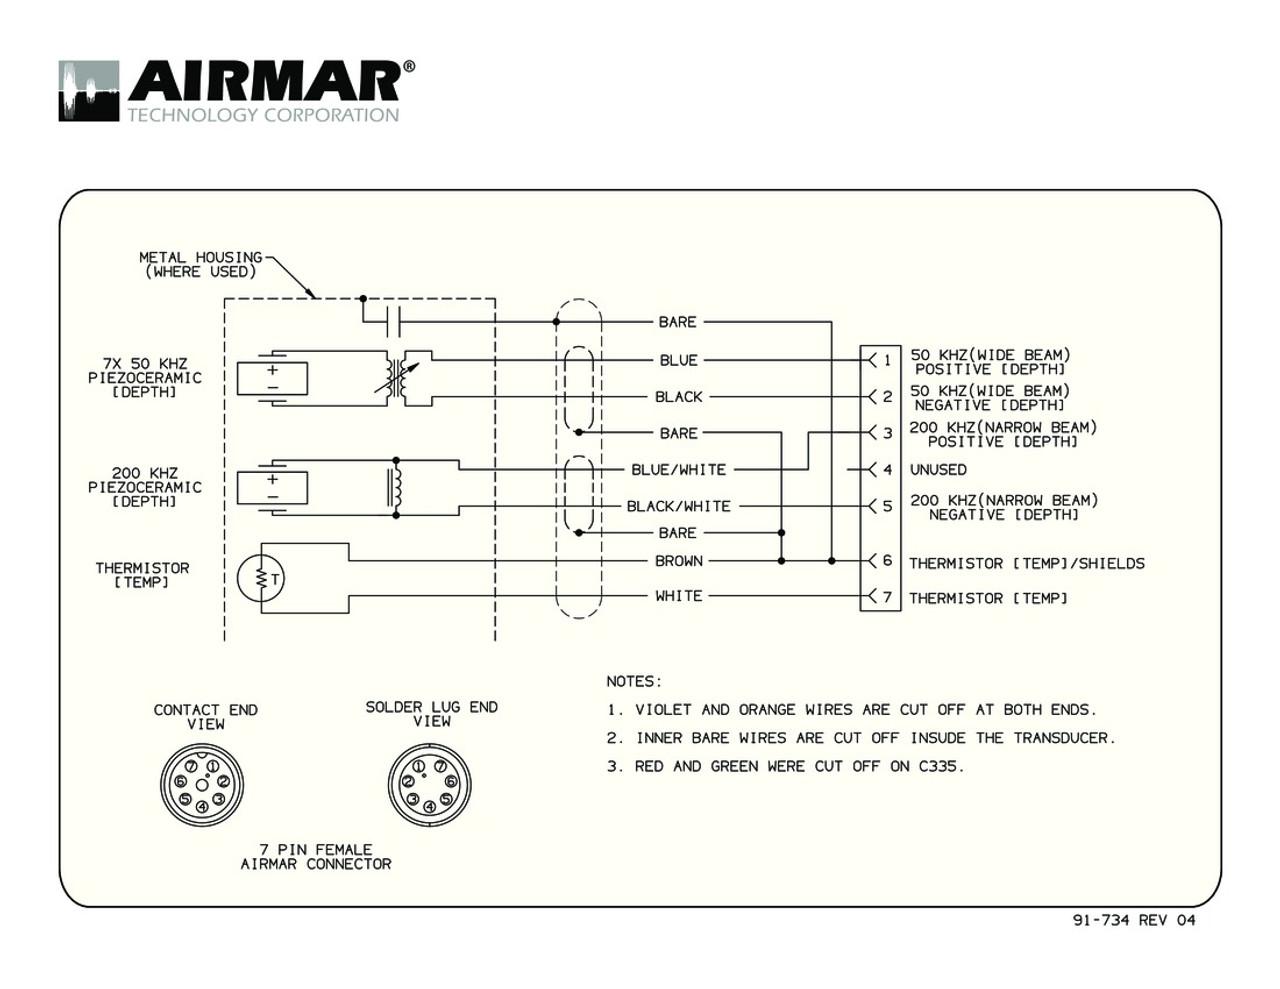 raymarine microphone wiring diagram | wiring library raymarine microphone wiring diagram #9